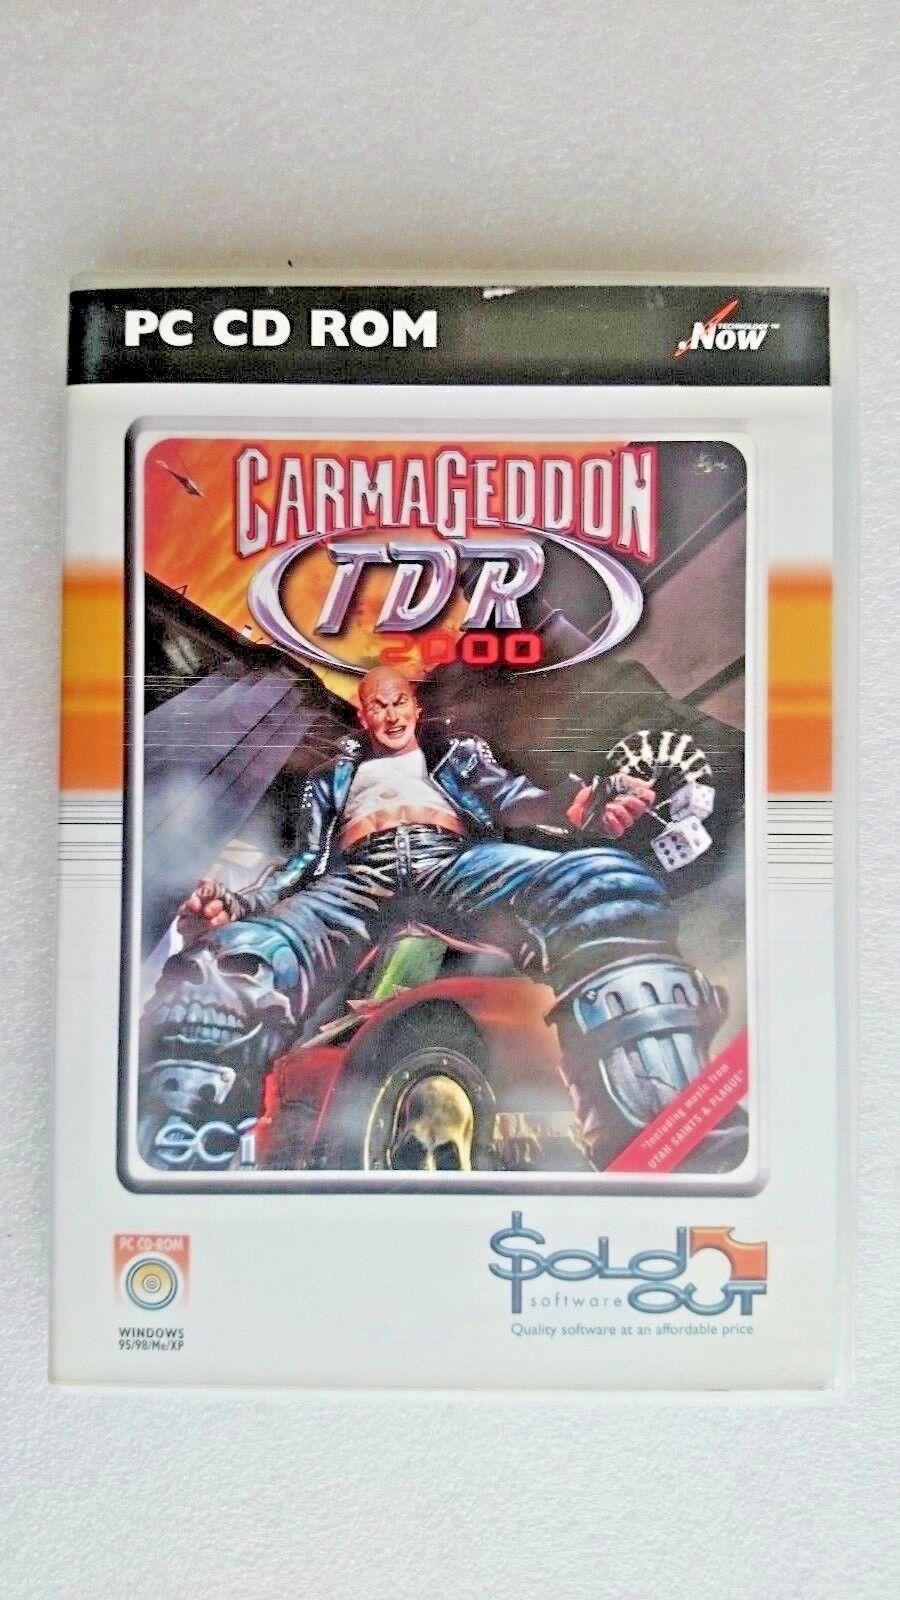 Carmageddon TDR 2000 (PC Windows 2000)